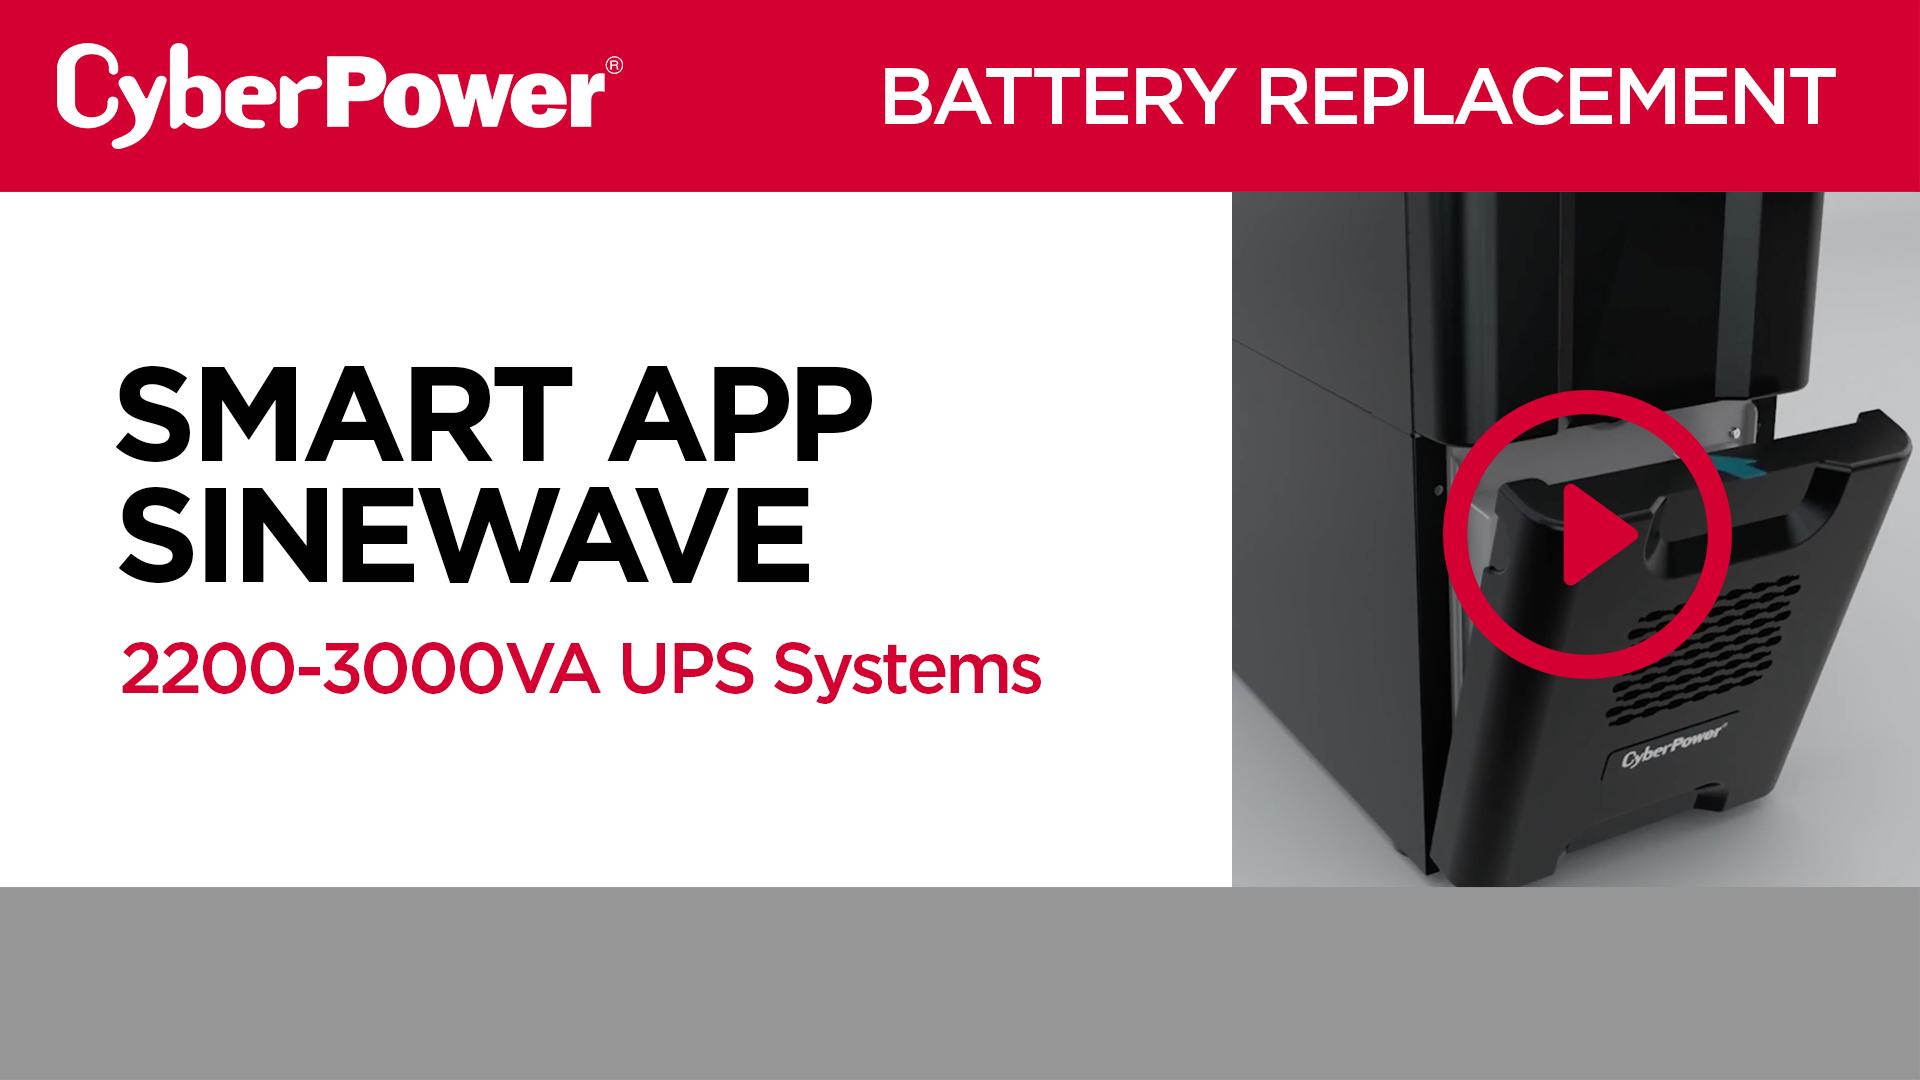 Smart App Sinewave 2200-3000VA Tower Replacement Battery